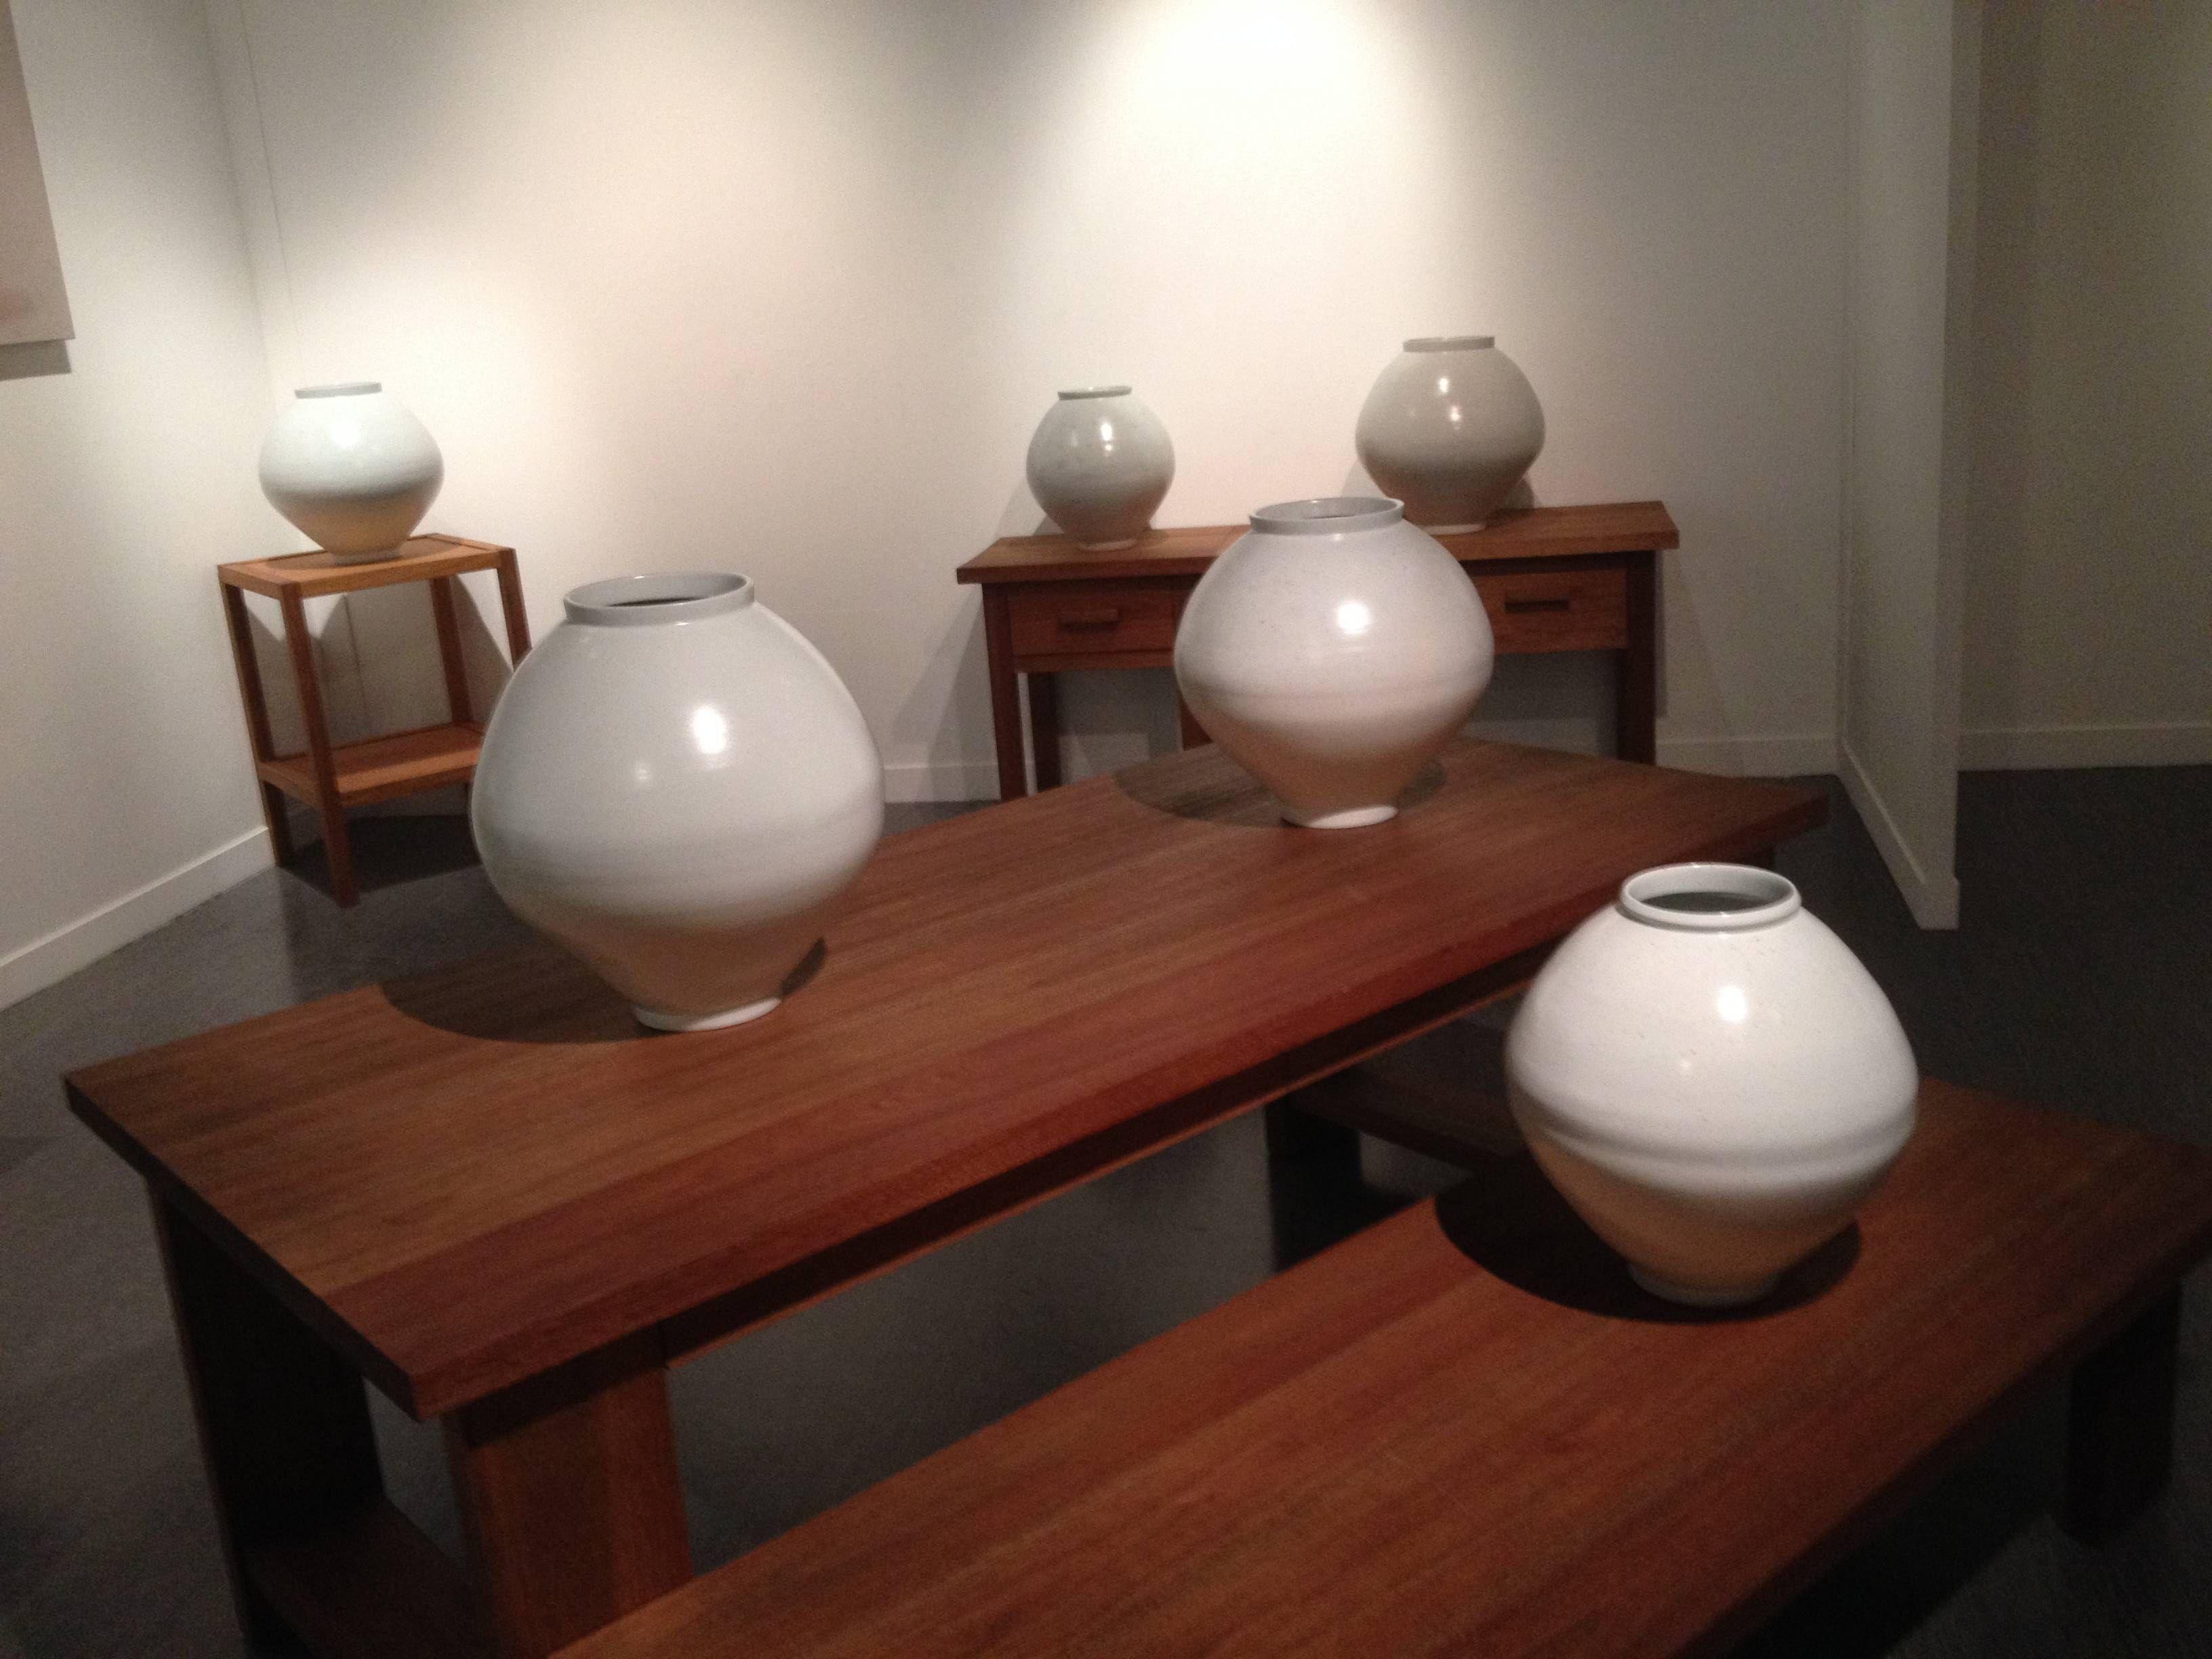 2014-06-07 Seoul Arts Center 036